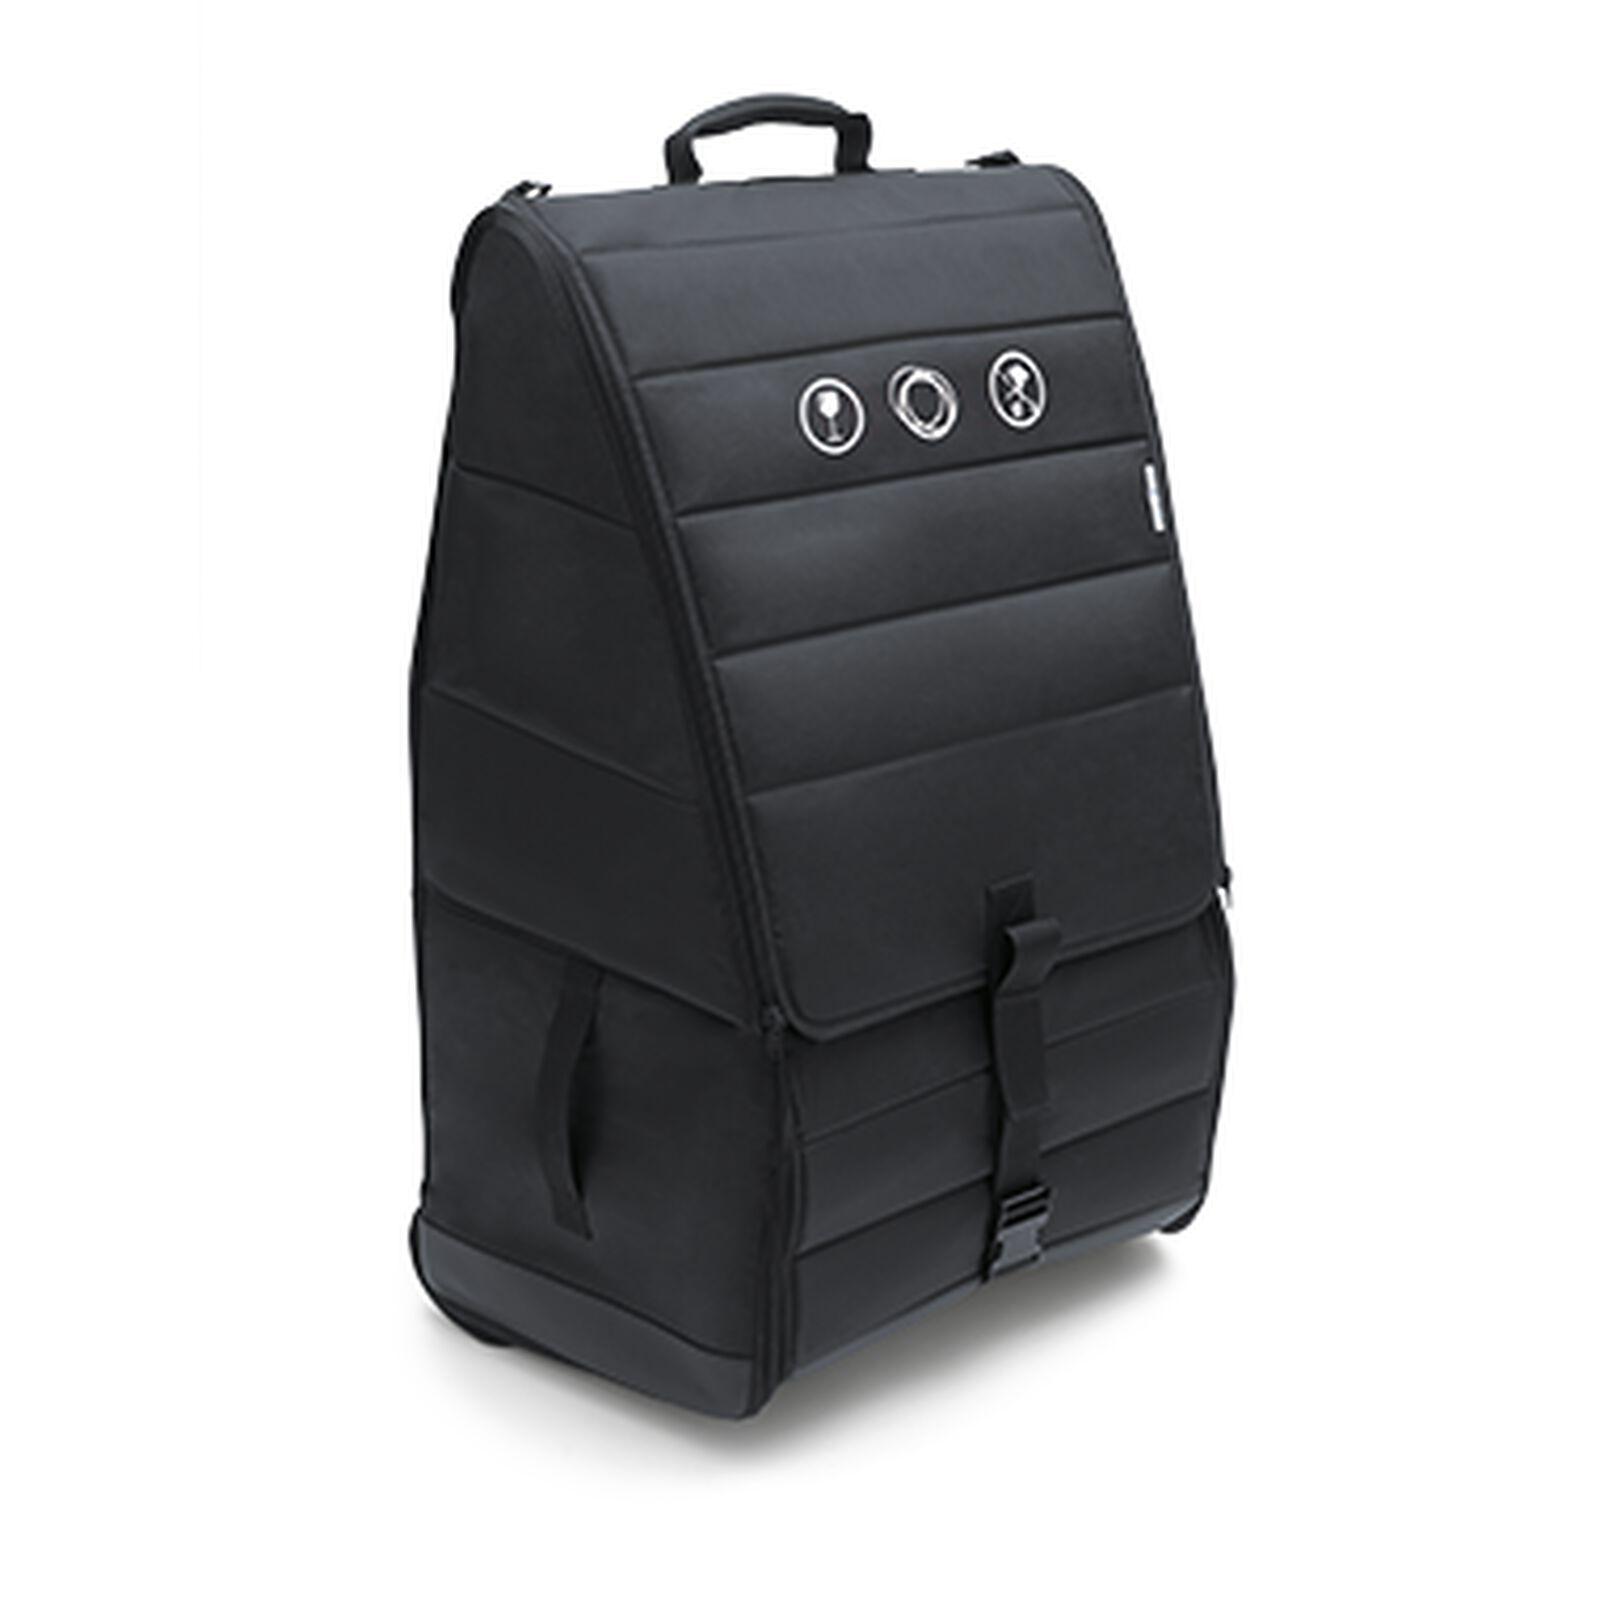 Bugaboo wheel bag for comfort transport bag